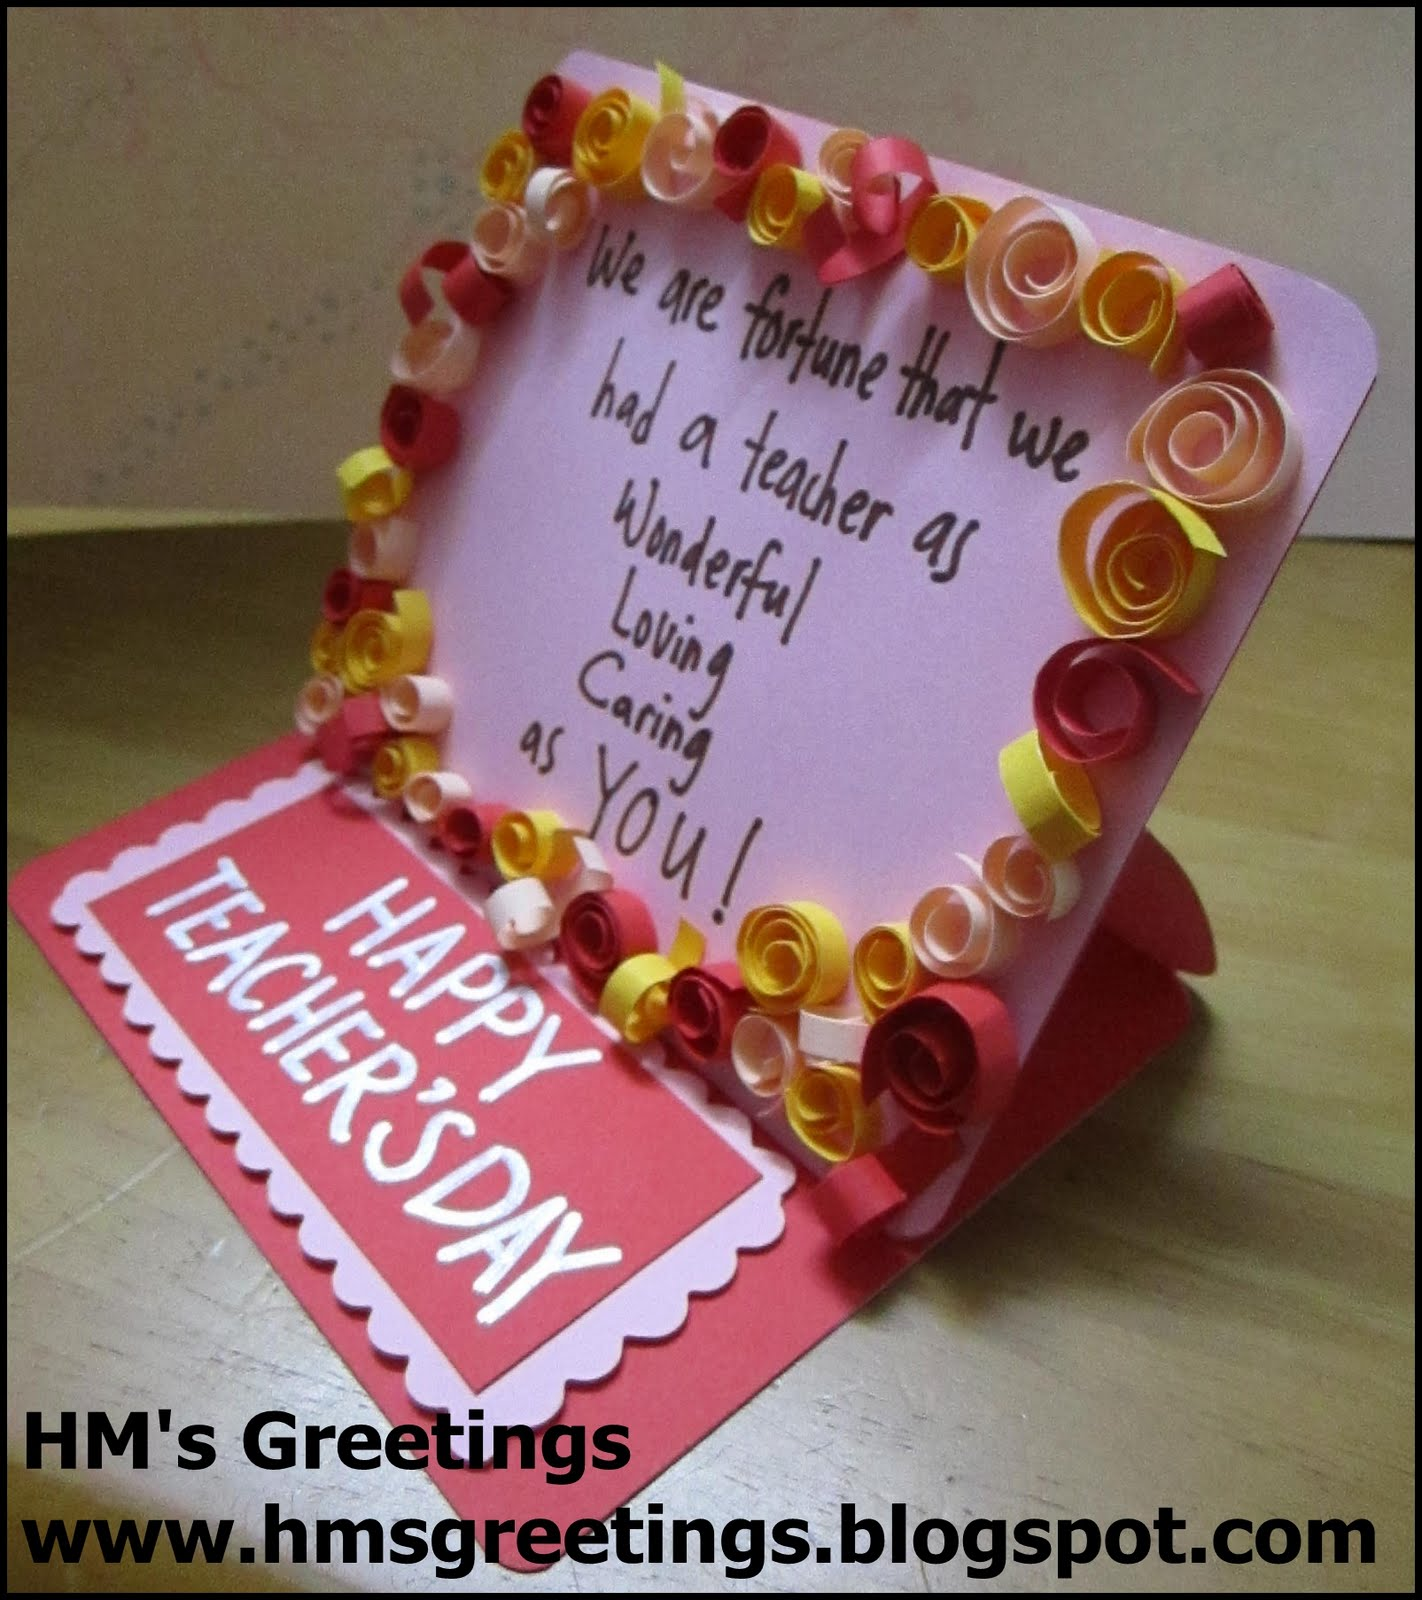 hm's greetings happy teachers' day card 1